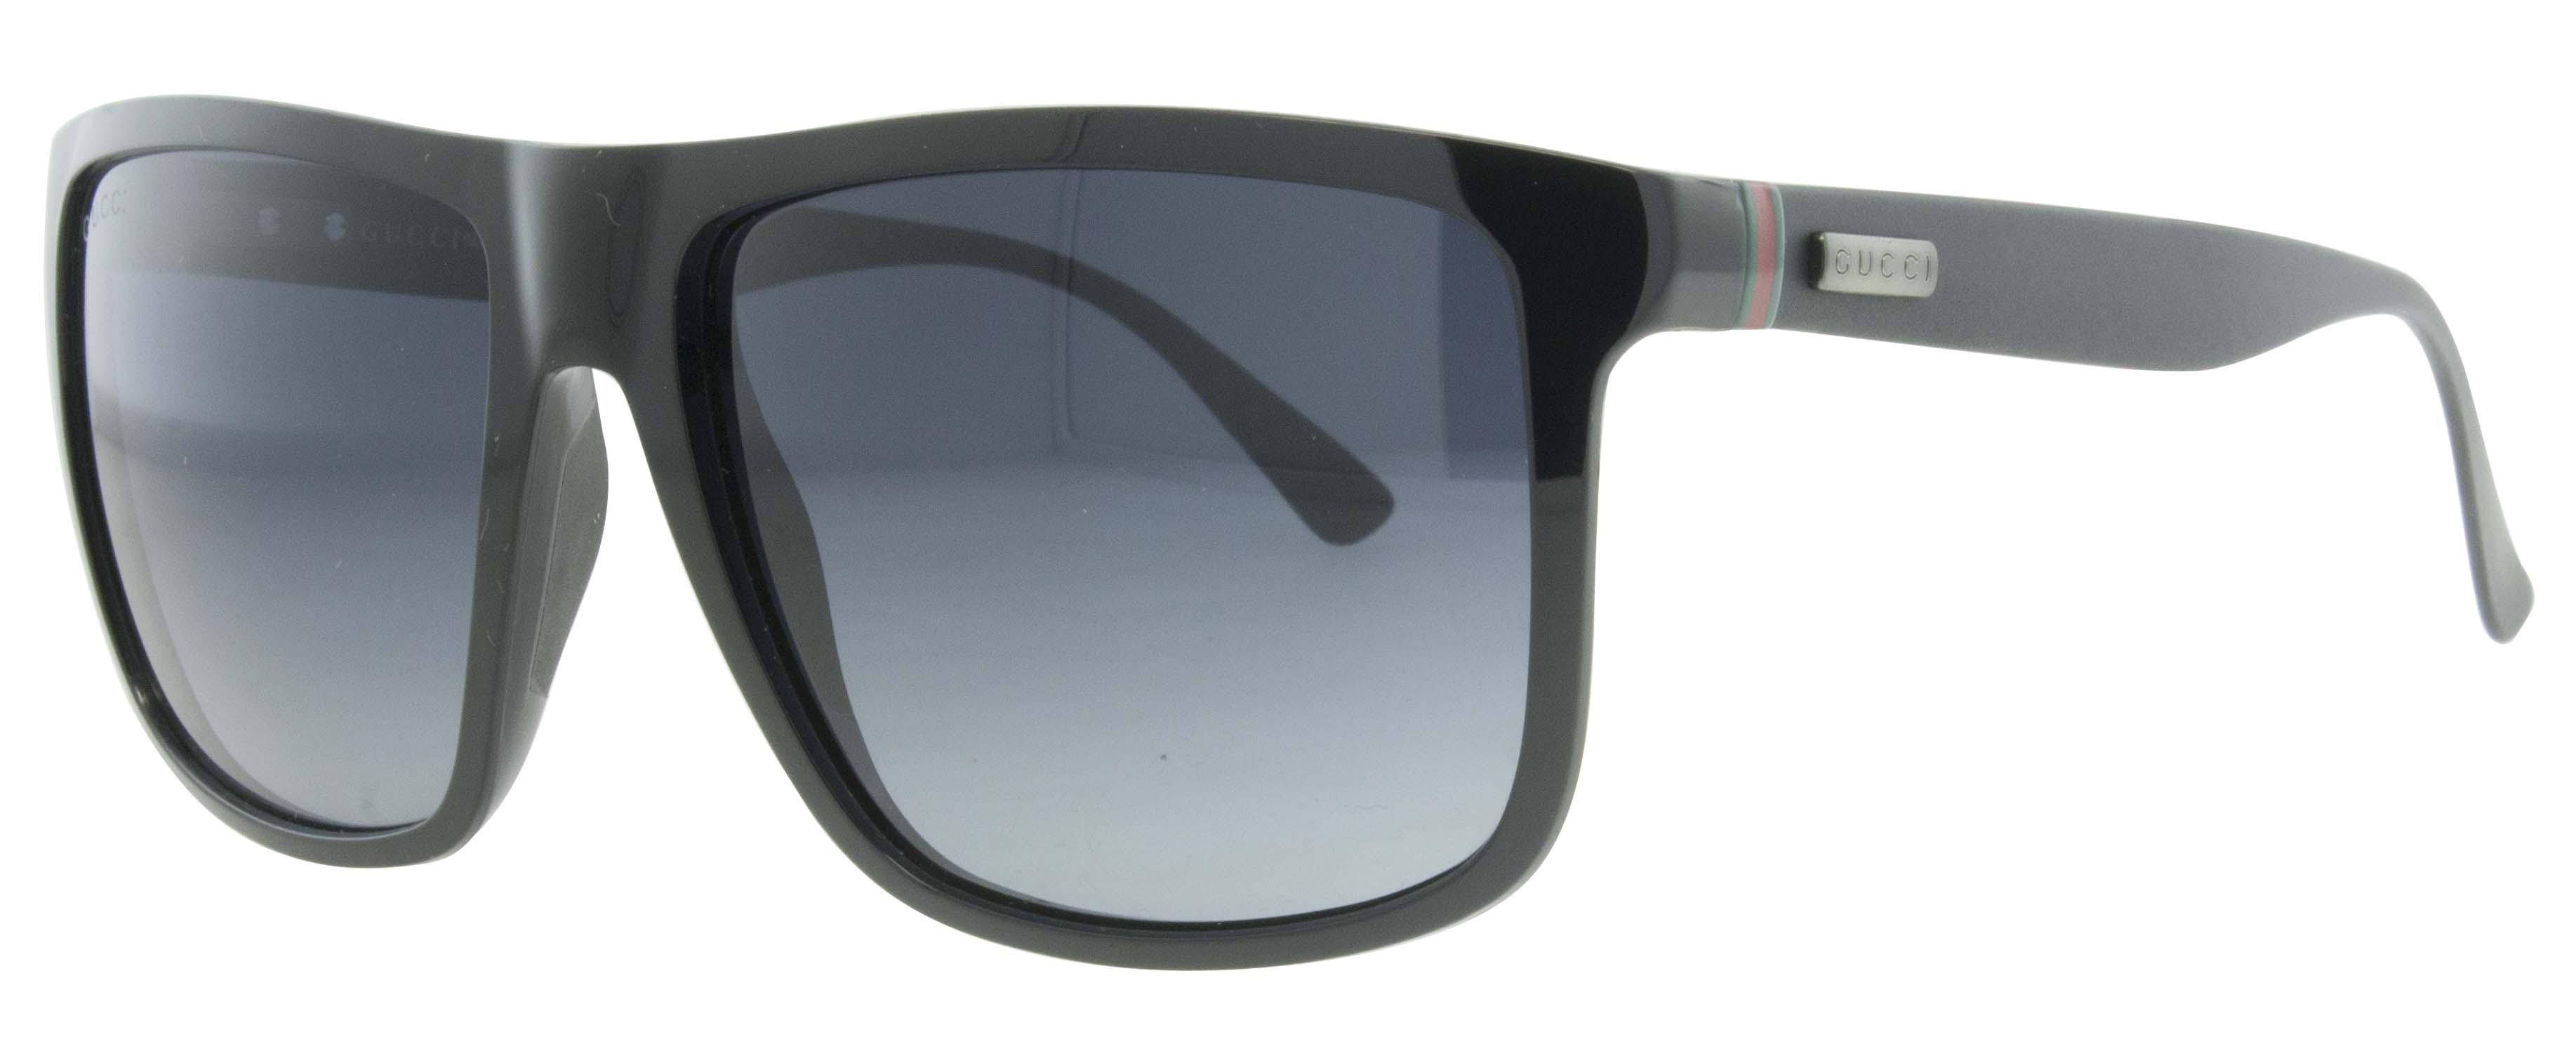 gucci gg 1075 s gvb hd matte black wayfarer men 39 s sunglasses. Black Bedroom Furniture Sets. Home Design Ideas